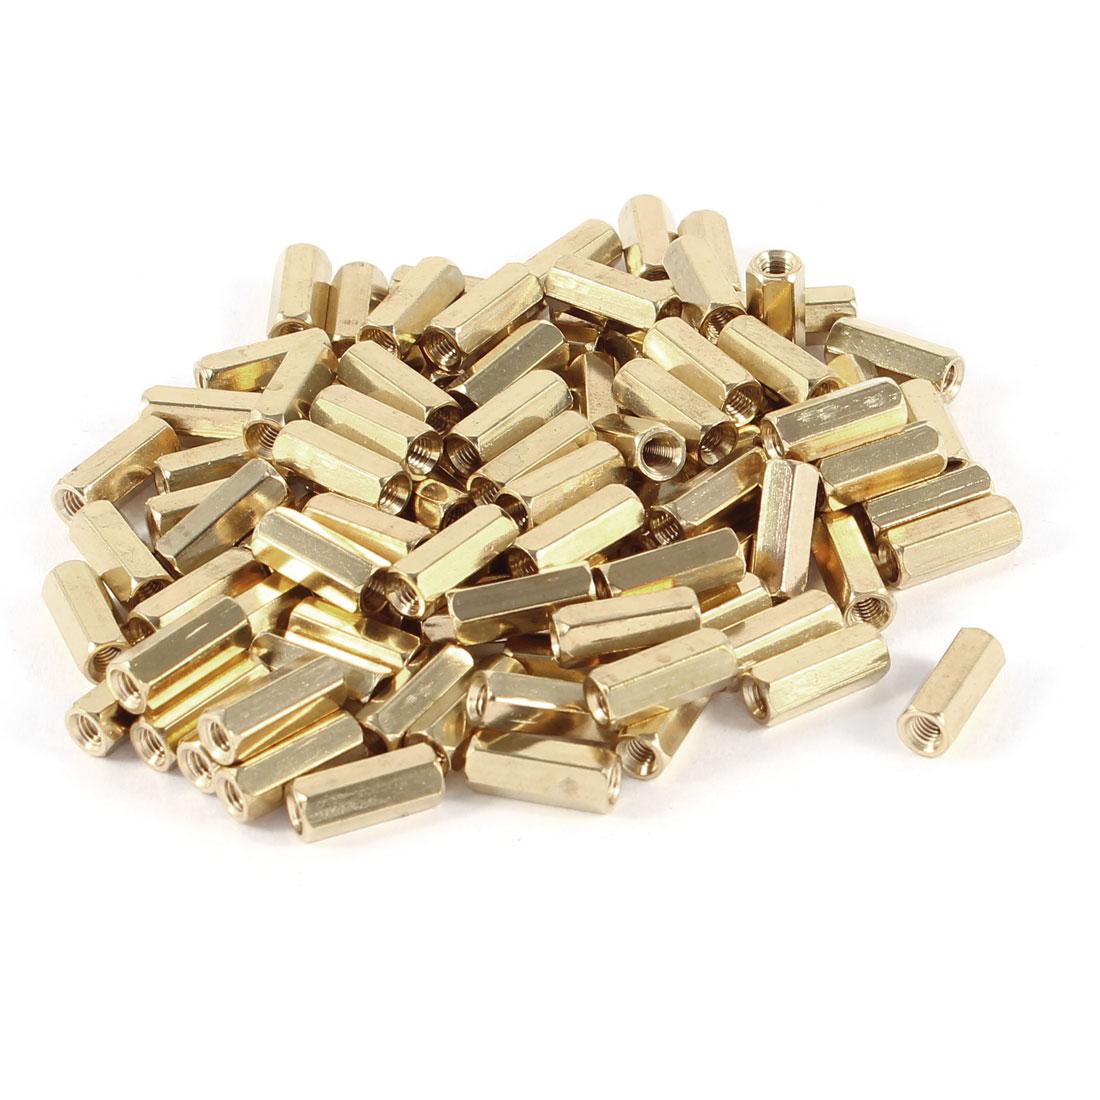 100 Pcs Hex Hexagon Female Nut Brass Standoff Spacer M3x12 M3 12mm